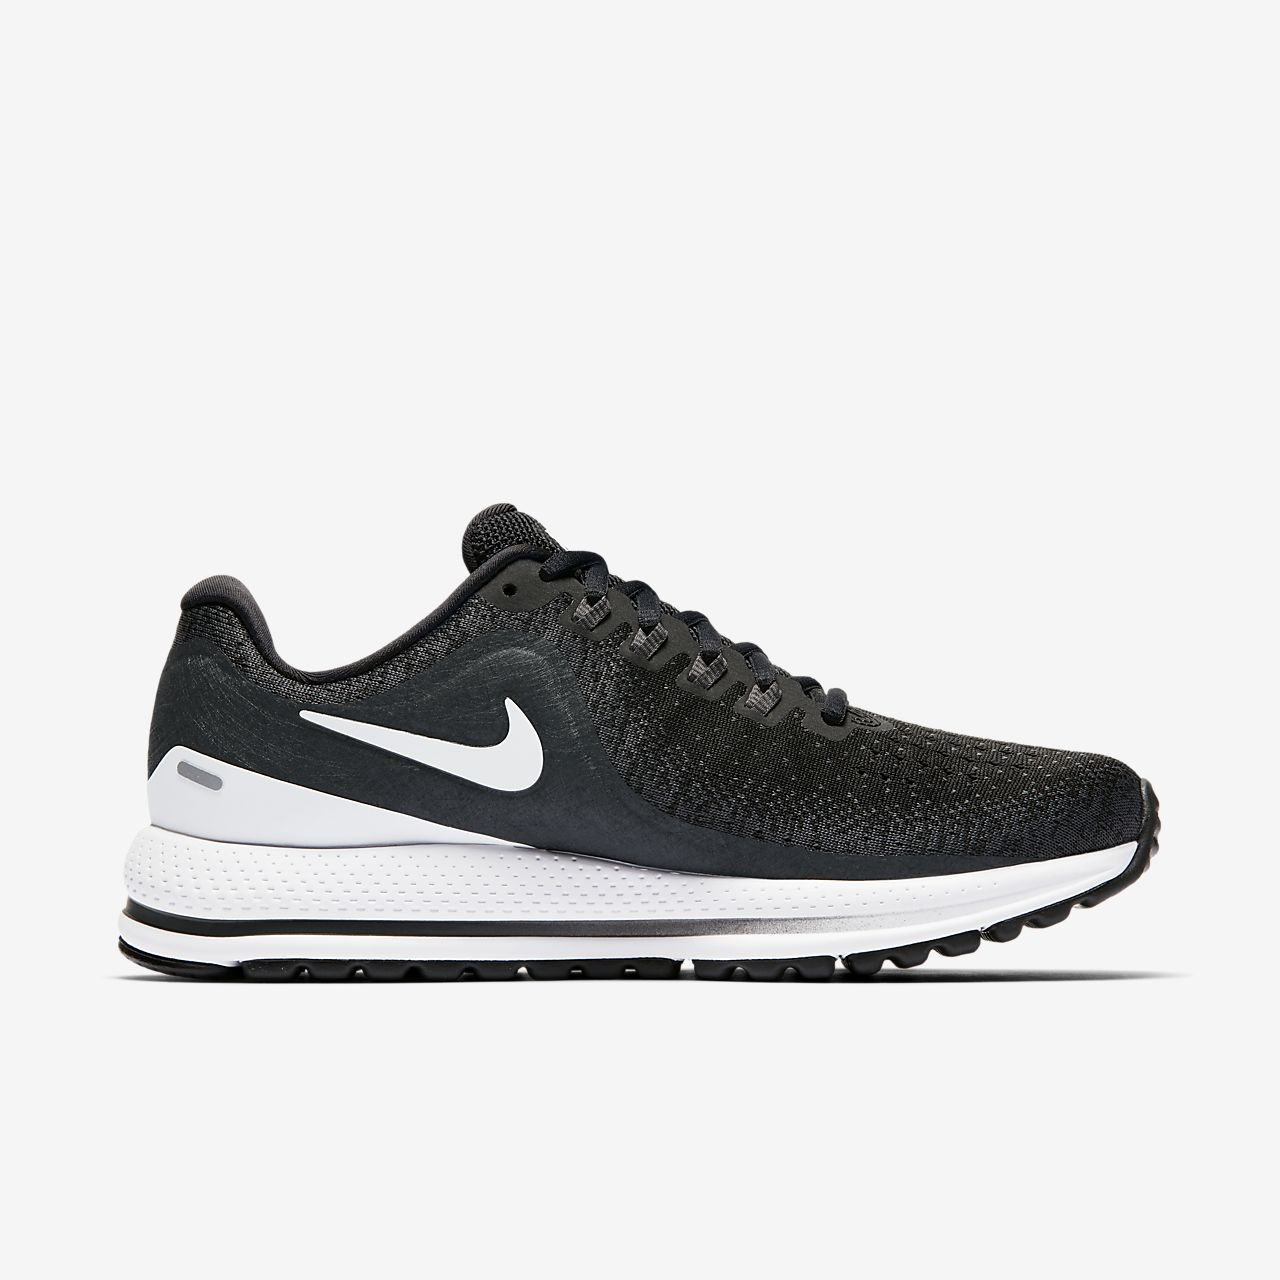 af163014f44 Nike Air Zoom Vomero 13 Women s Running Shoe. Nike.com DK